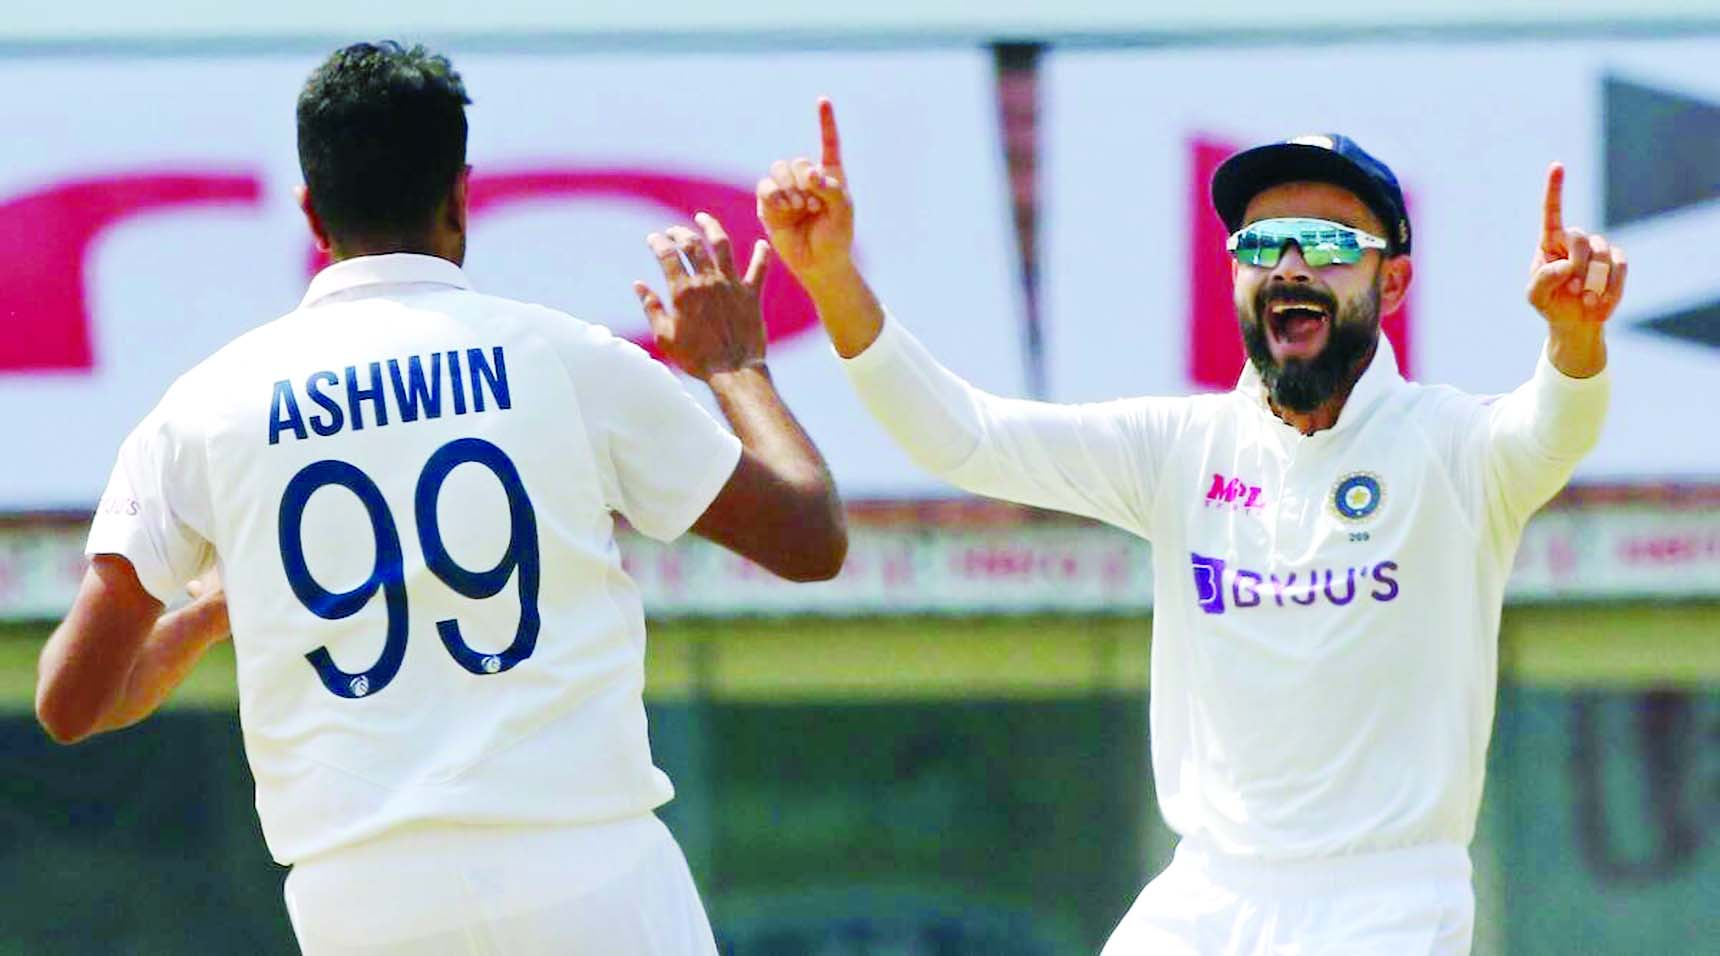 Sundar, Ashwin lead India's fightback but England's match to win